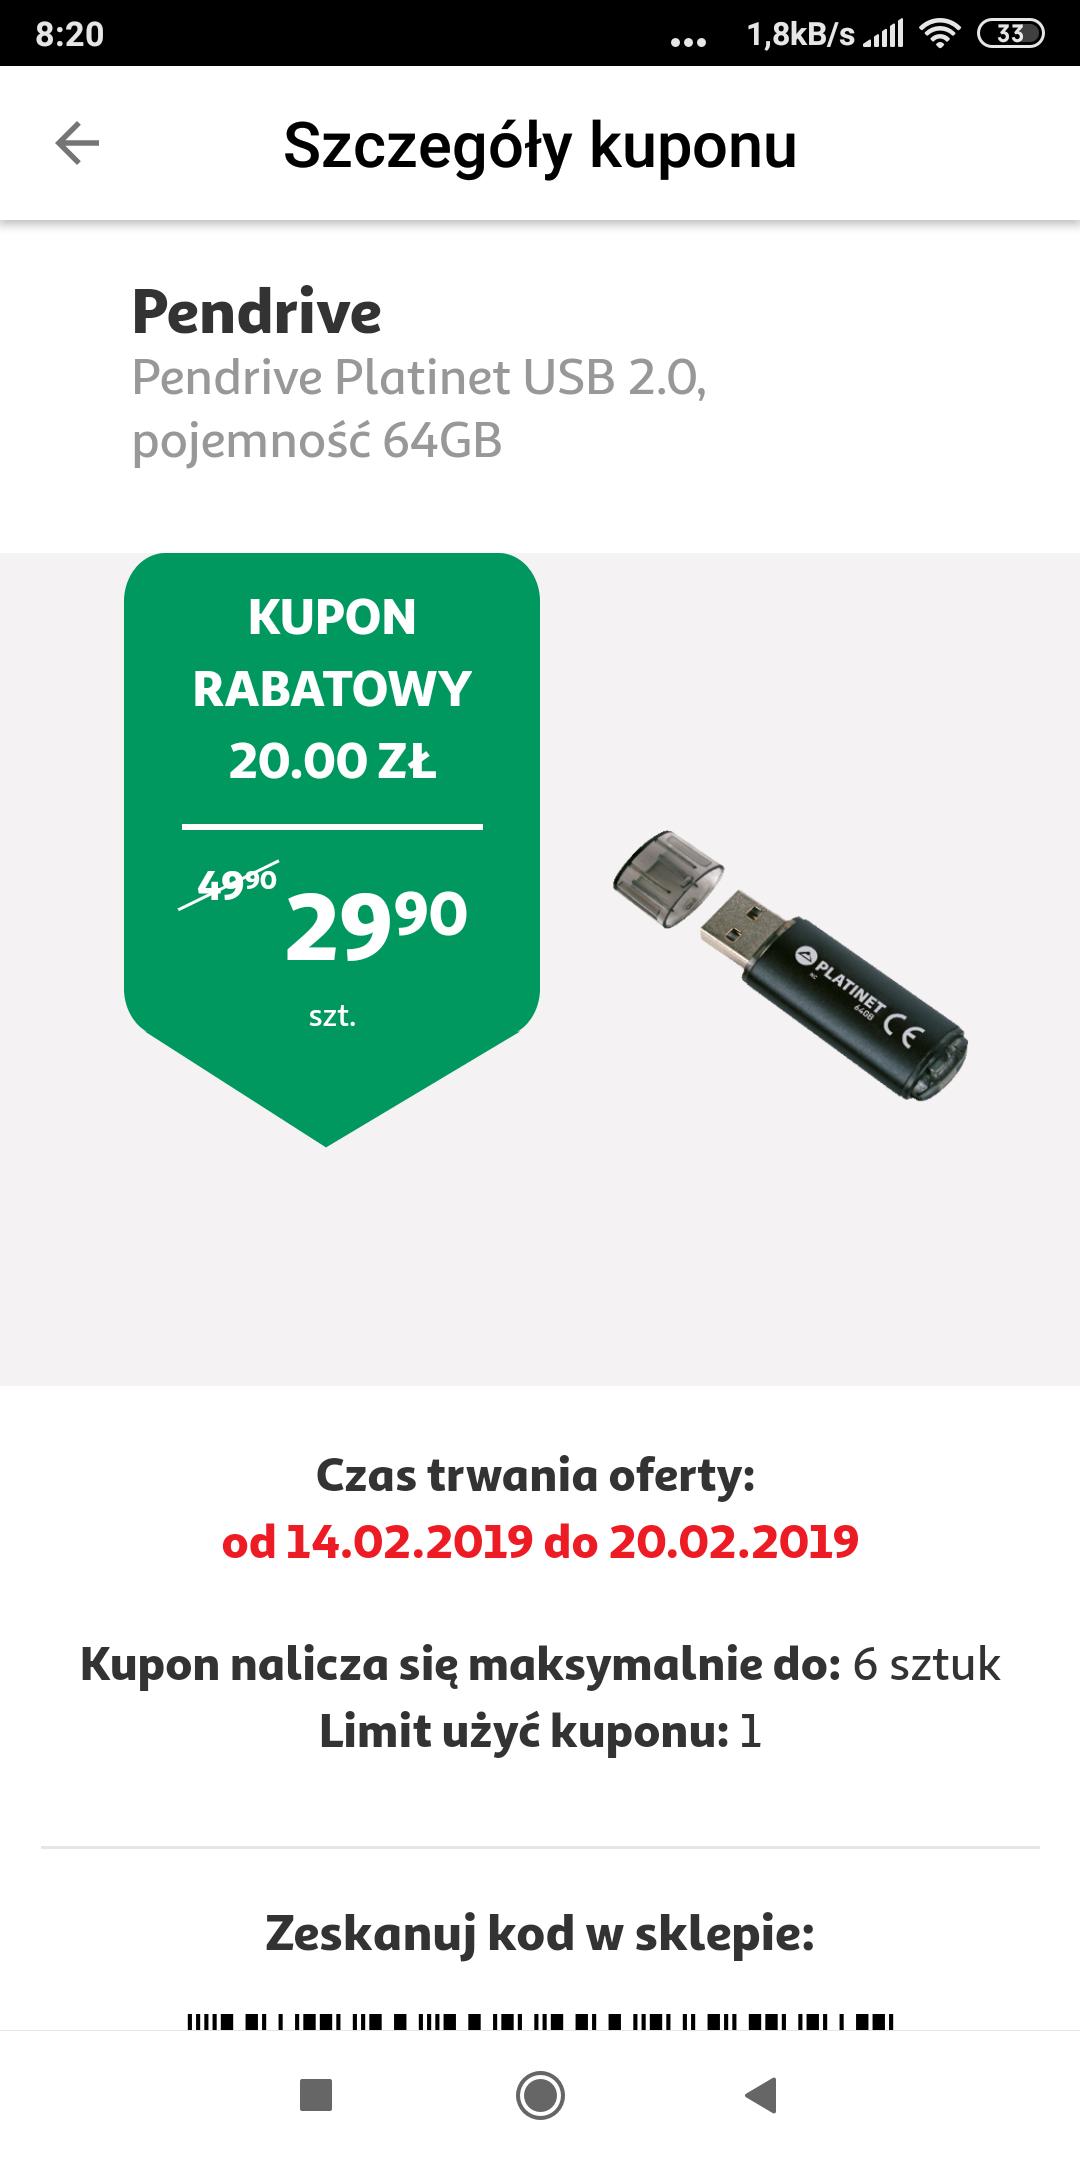 Pendrive Platinet USB 2.0, pojemność 64GB